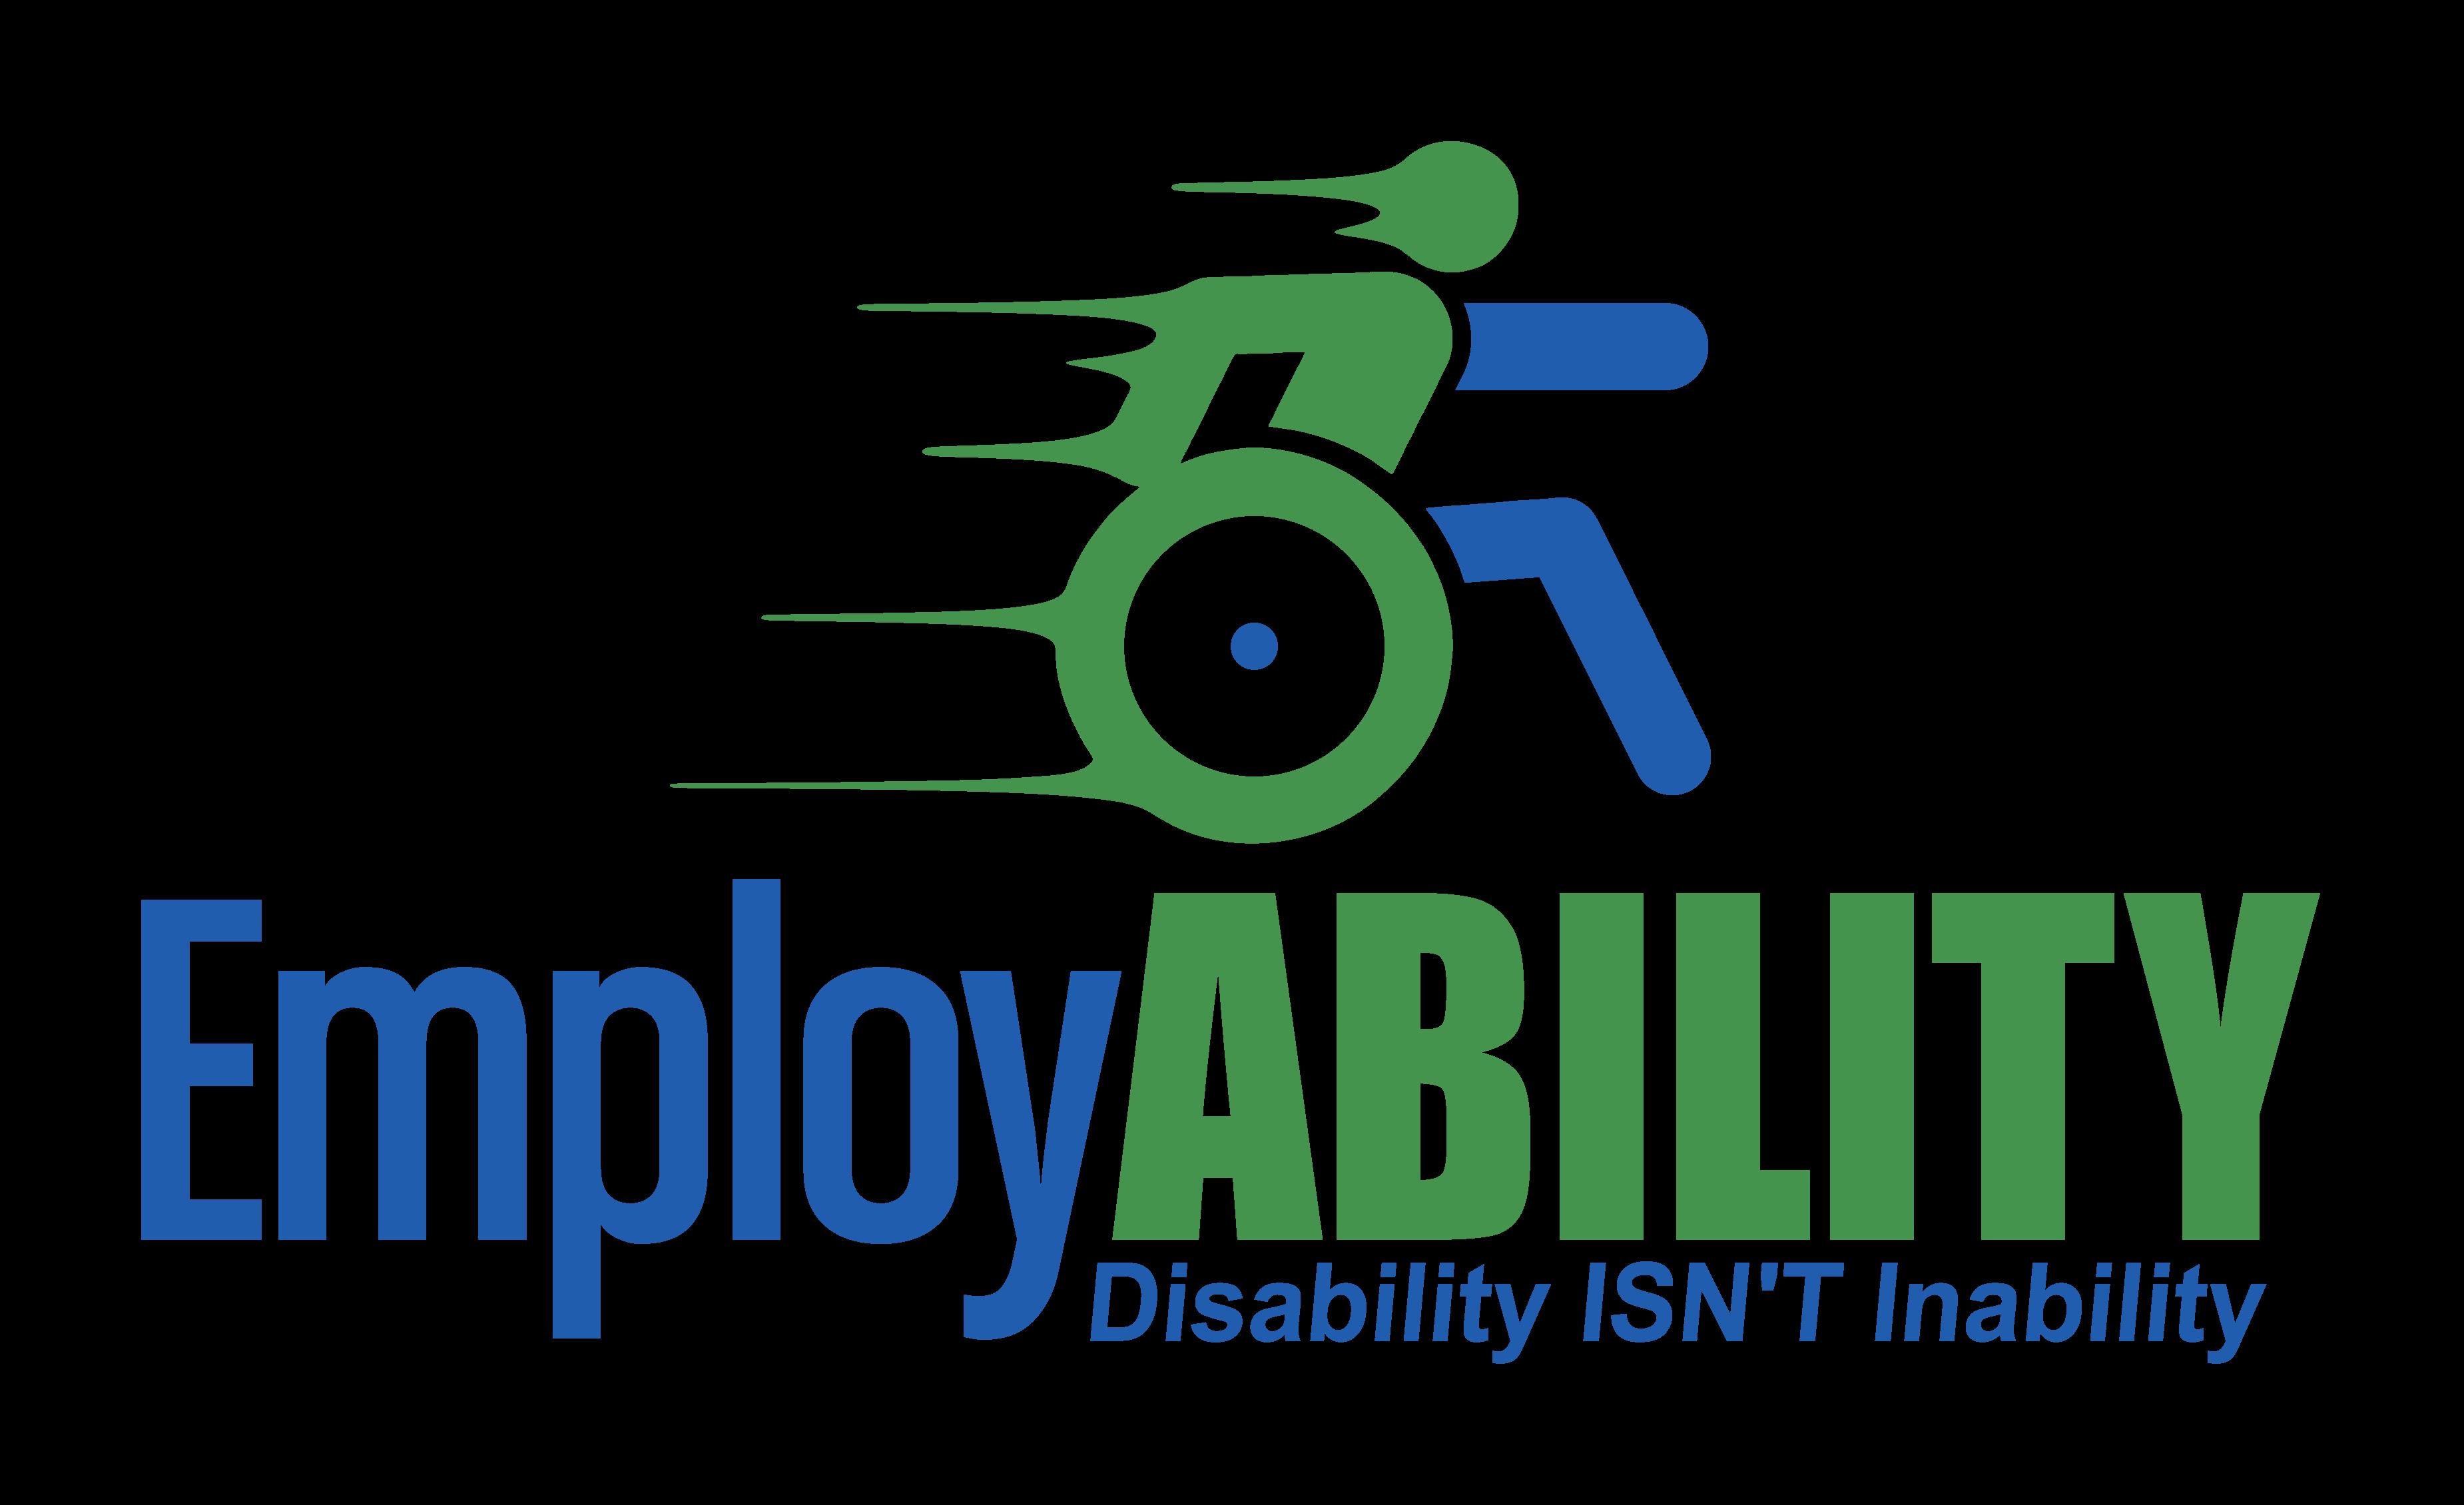 EmployABILITY/Austin